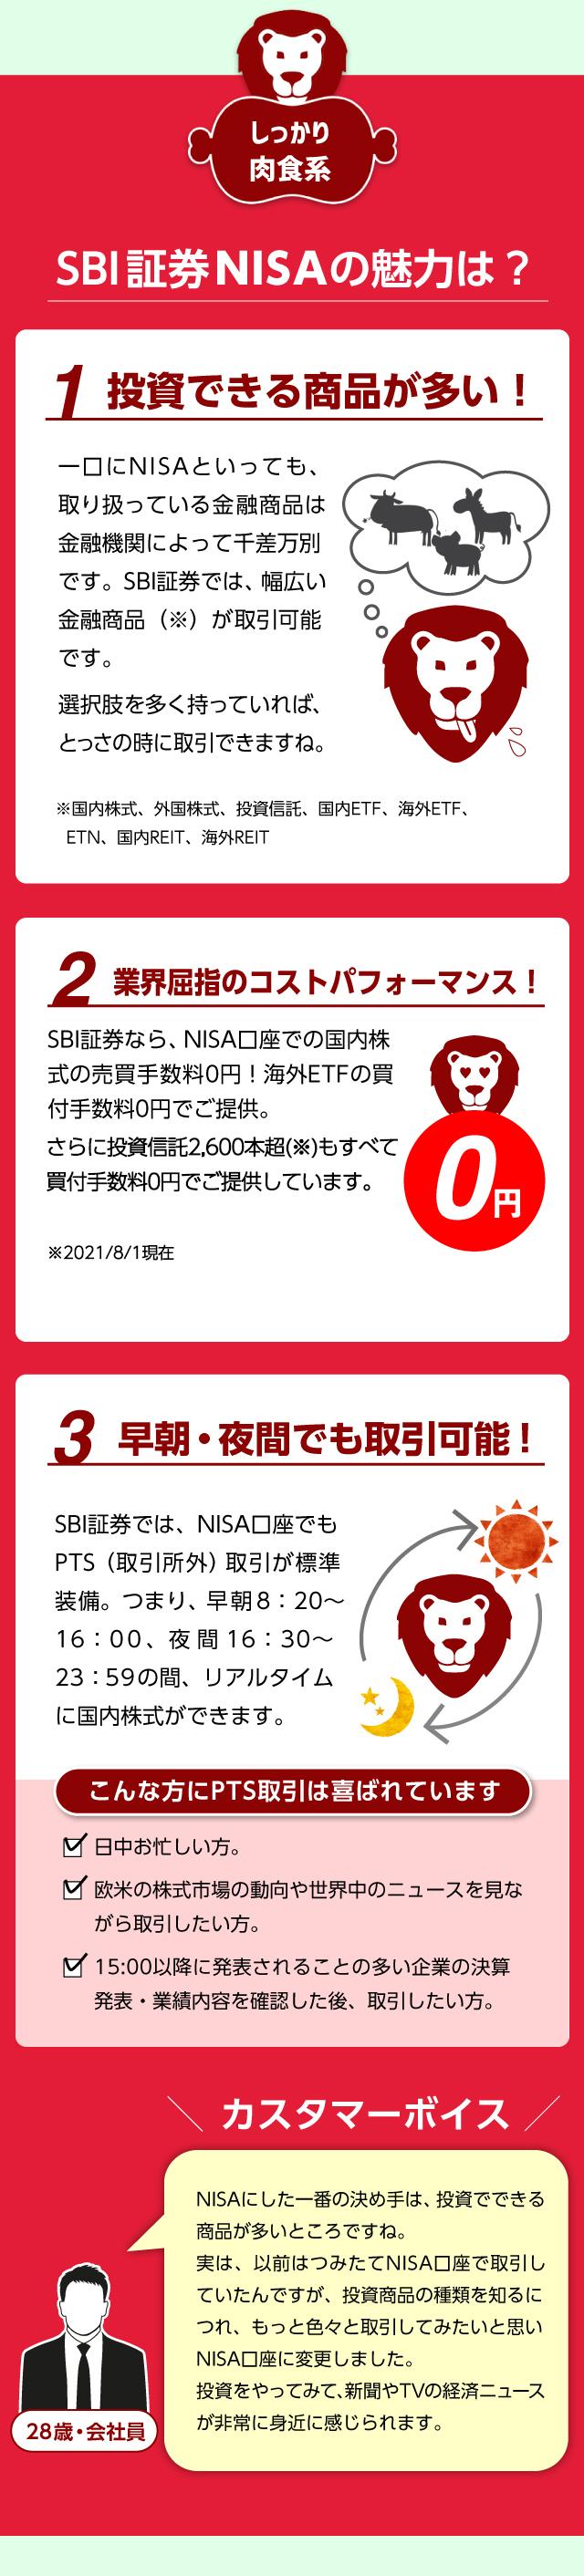 SBI証券NISAの魅力